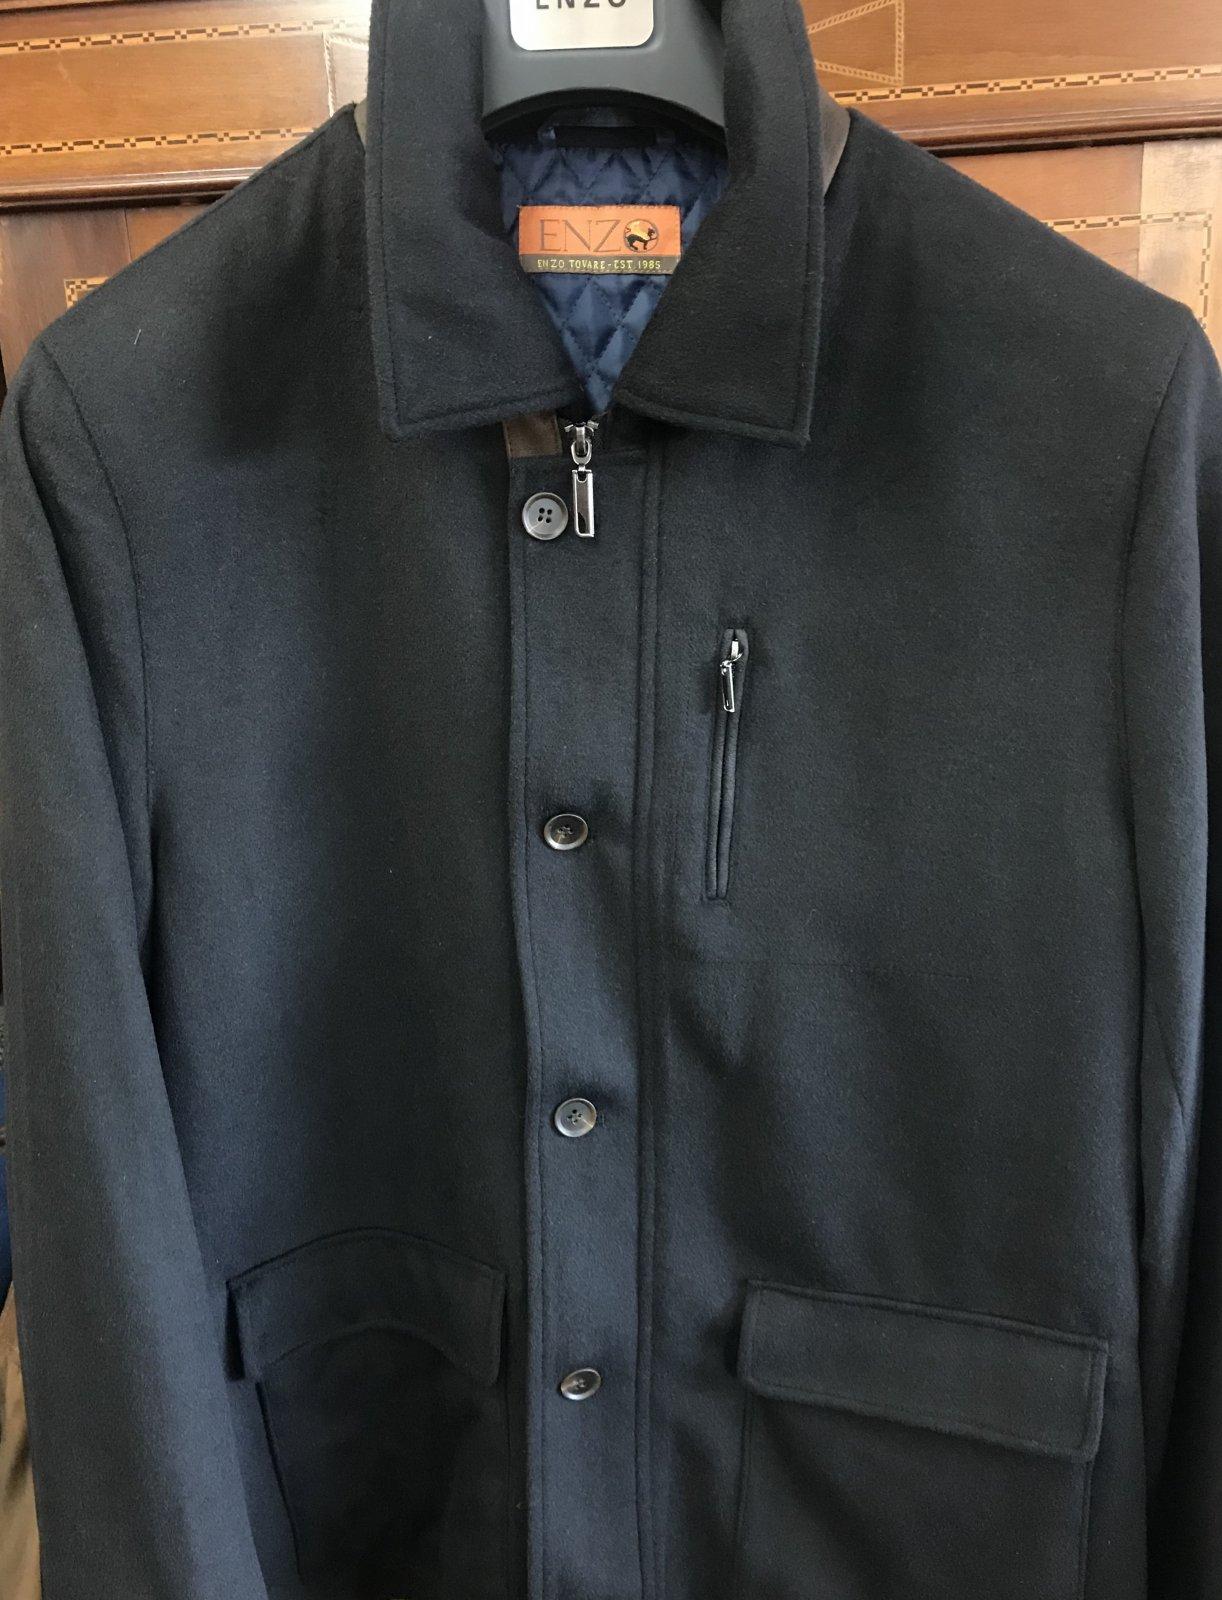 Enzo Kami Jacket